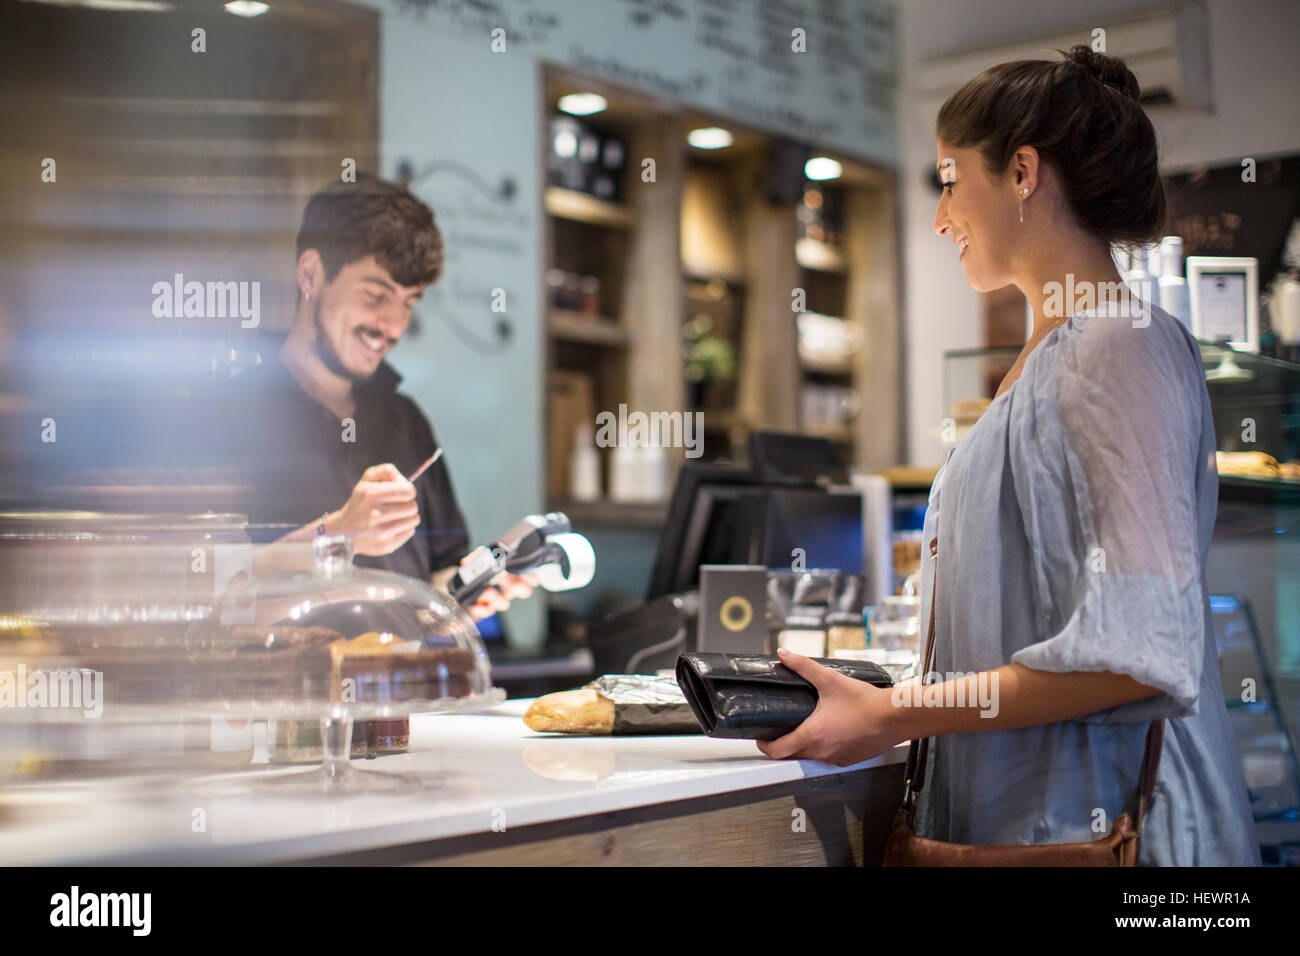 Barista cálculo de factura de cliente femenino en el cafe counter Imagen De Stock